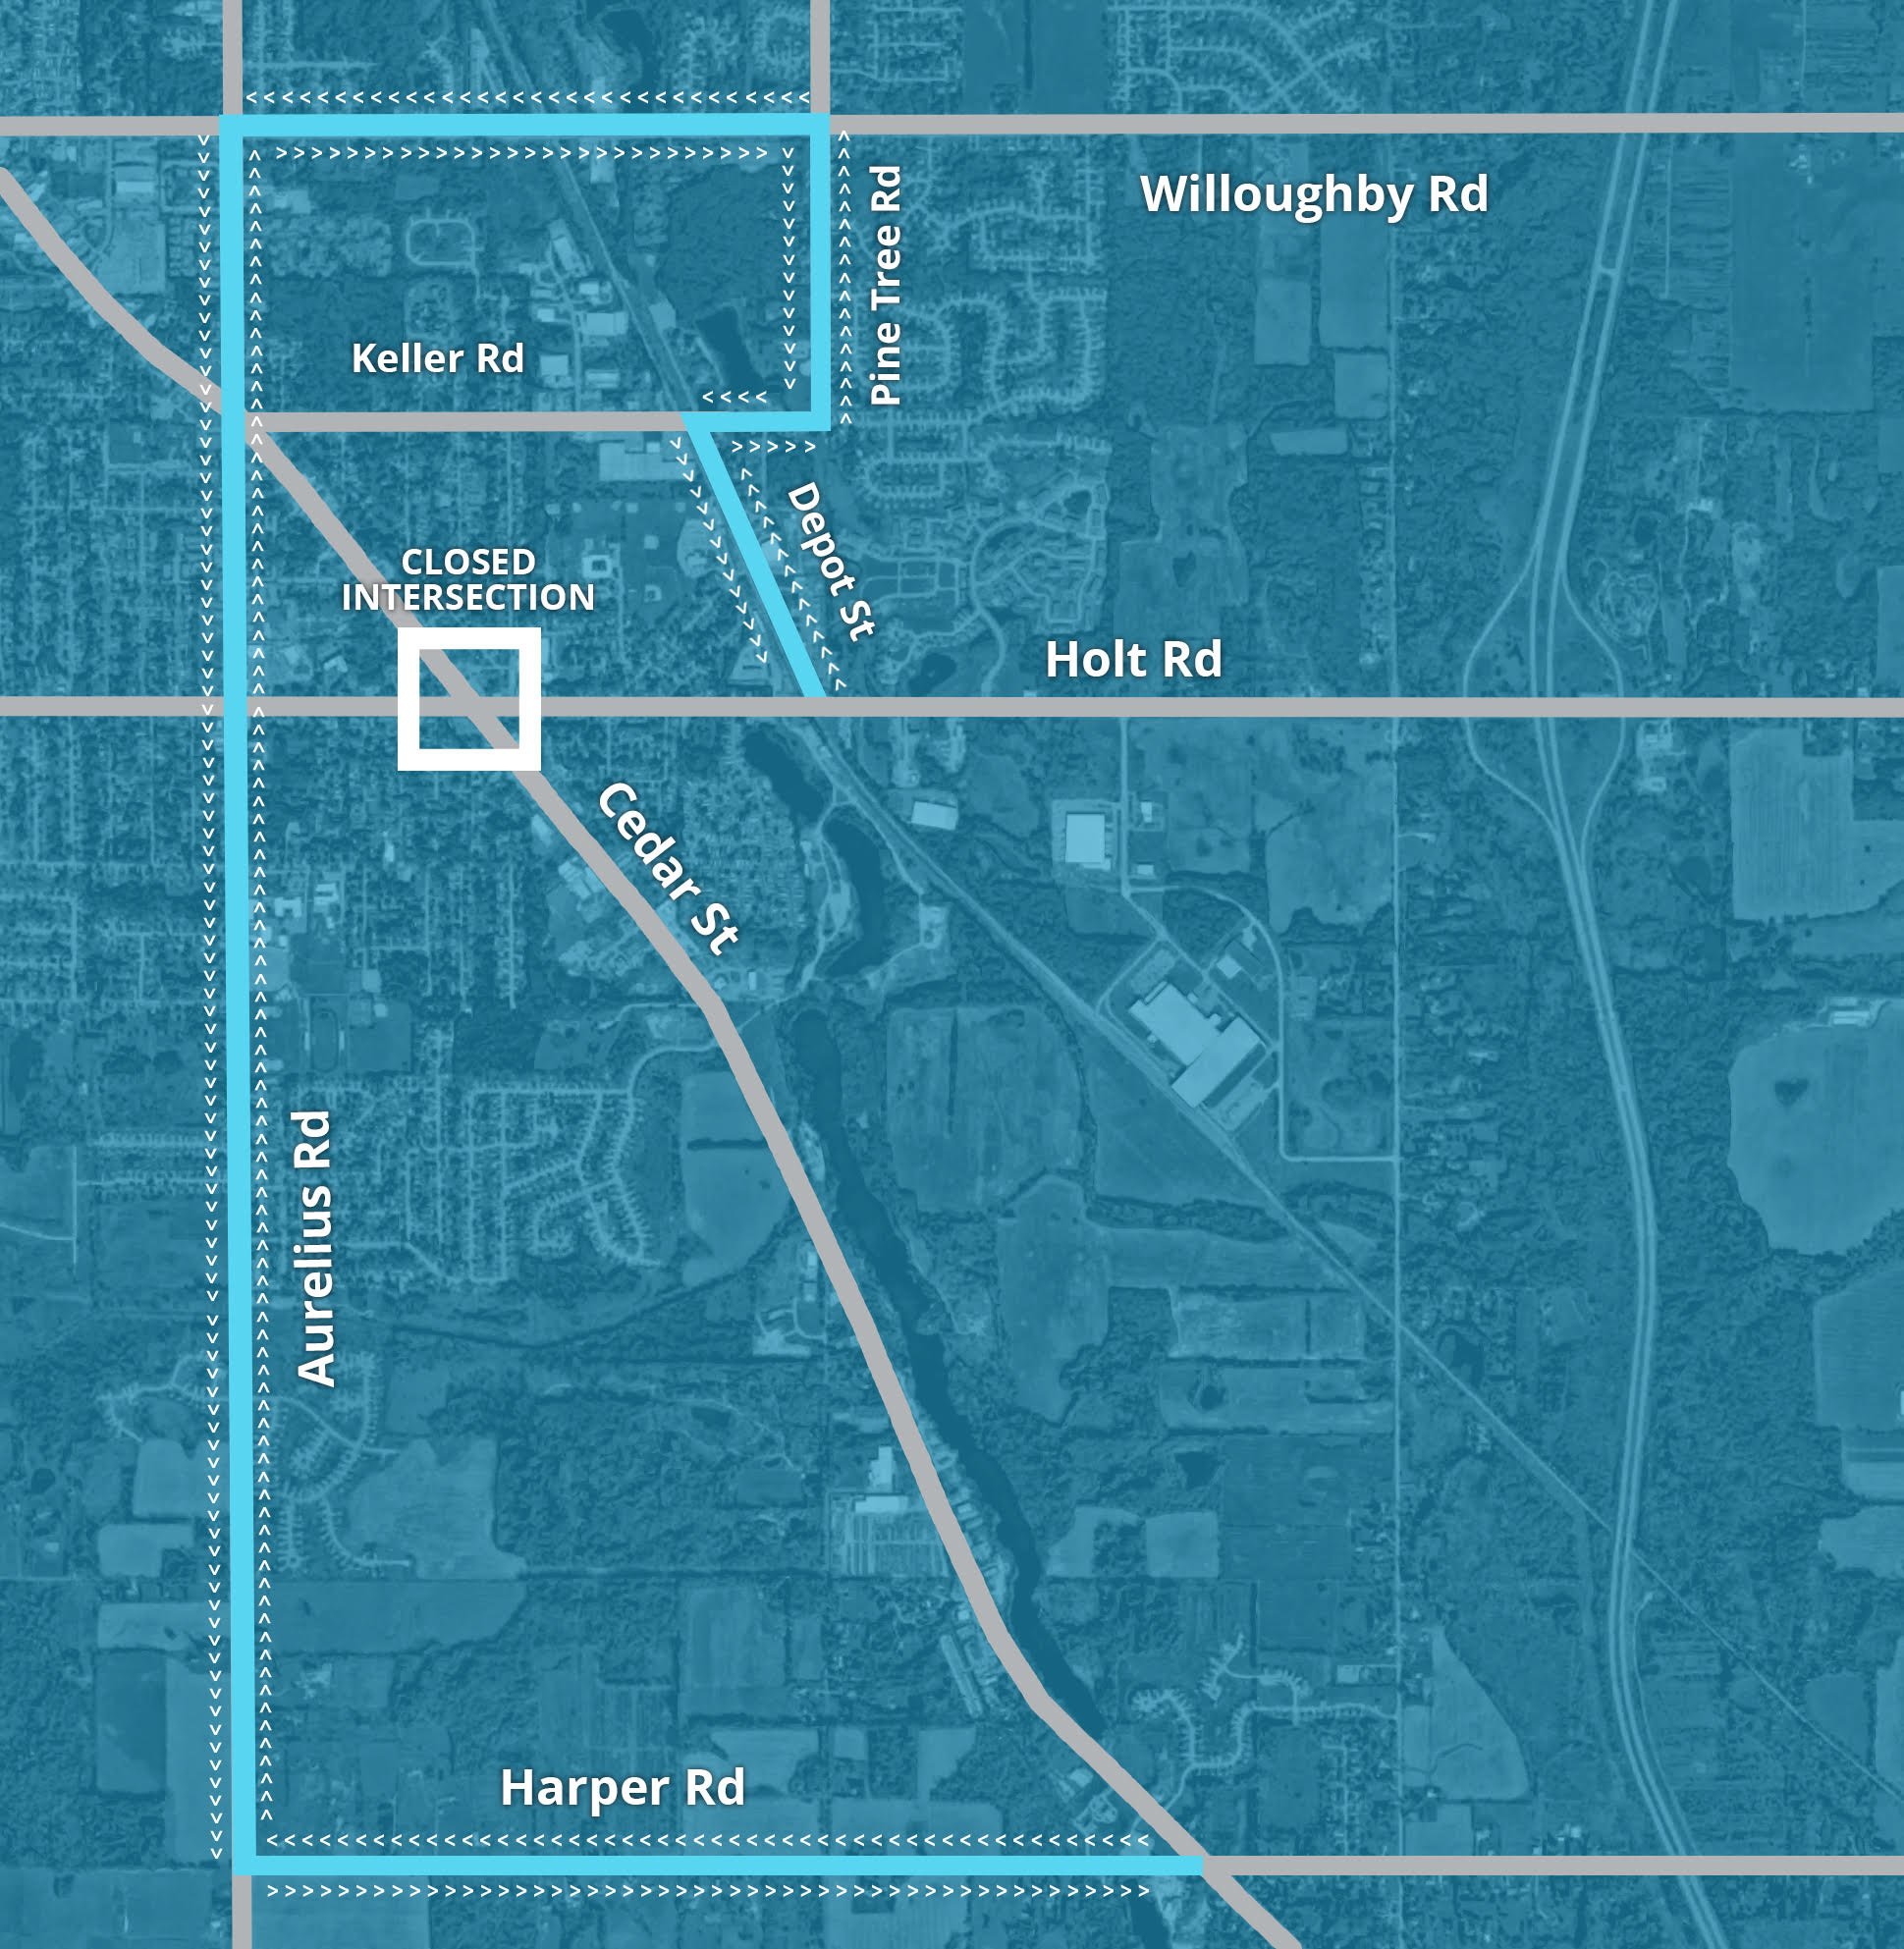 Holt-Cedar-Detour-Map-Aug2018.jpg